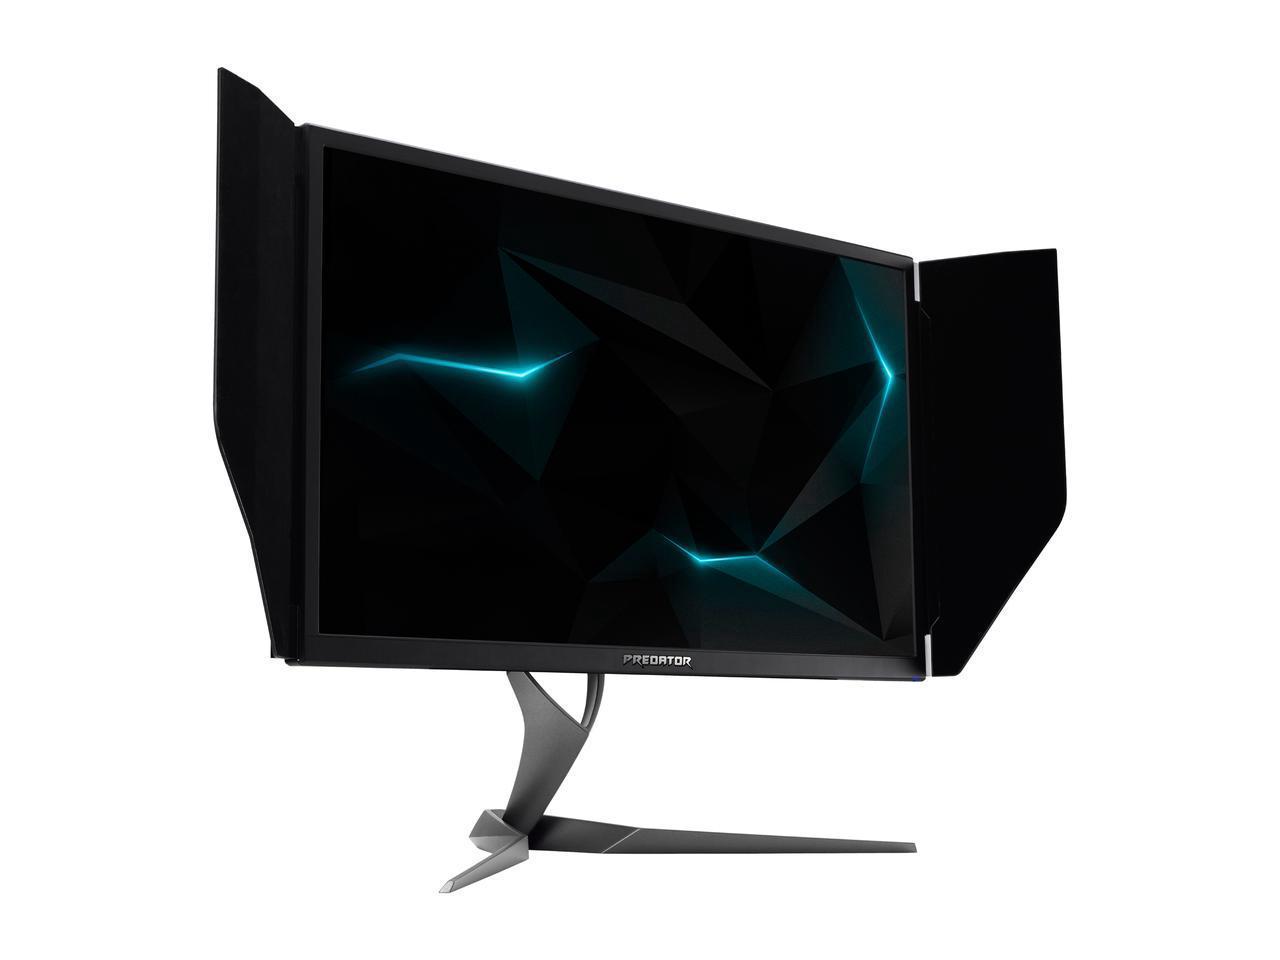 4K G-Sync HDR oyuncu monitörü, Acer Predator X27